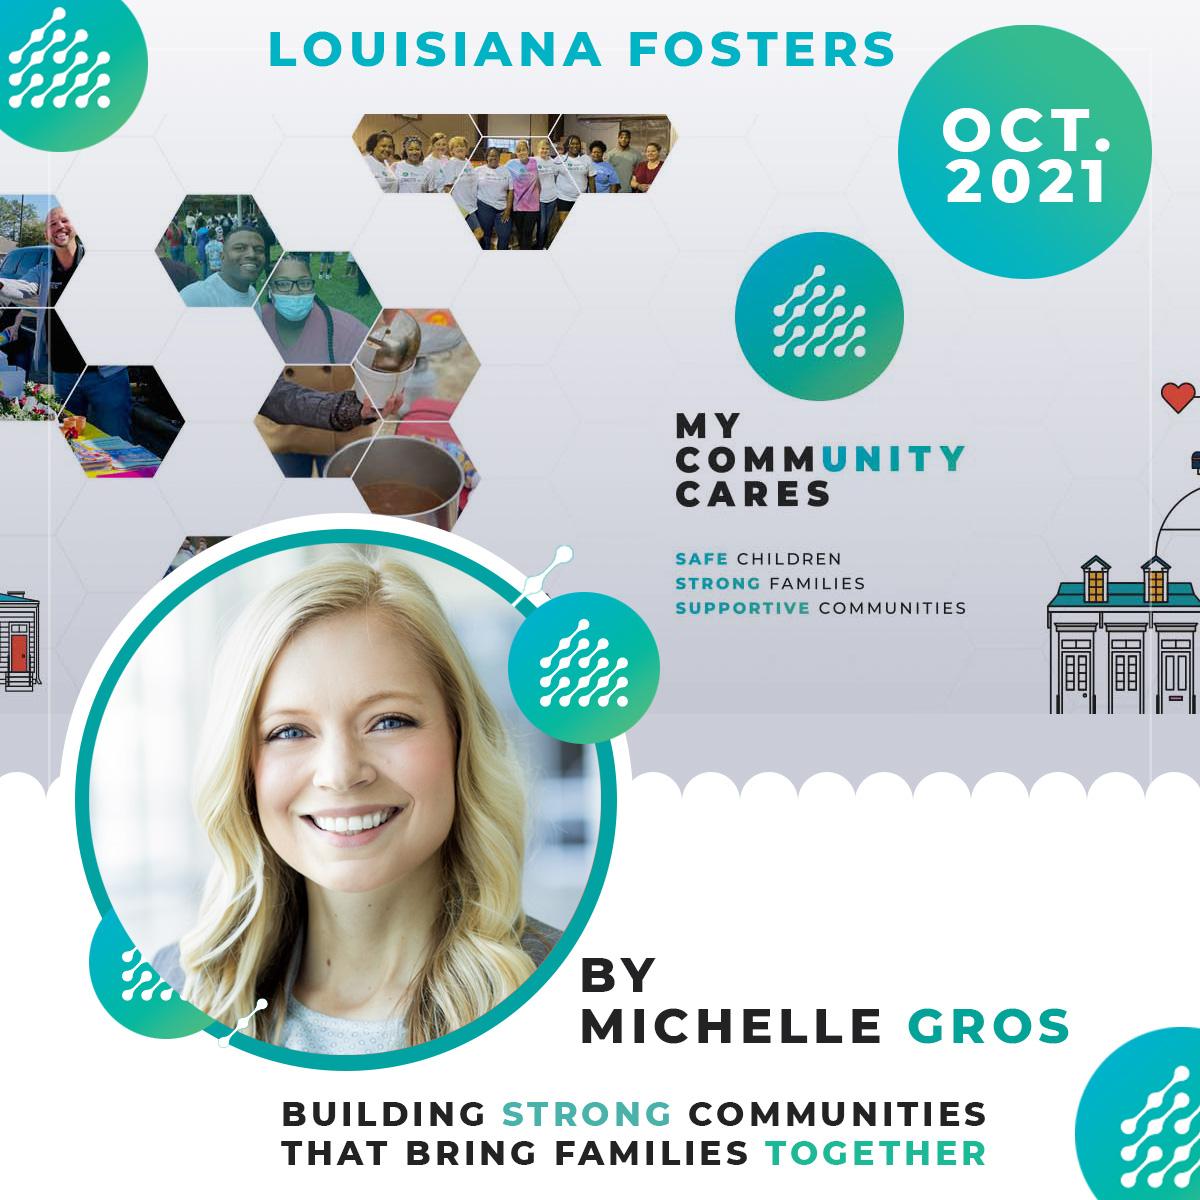 Louisiana Fosters – My Community Cares